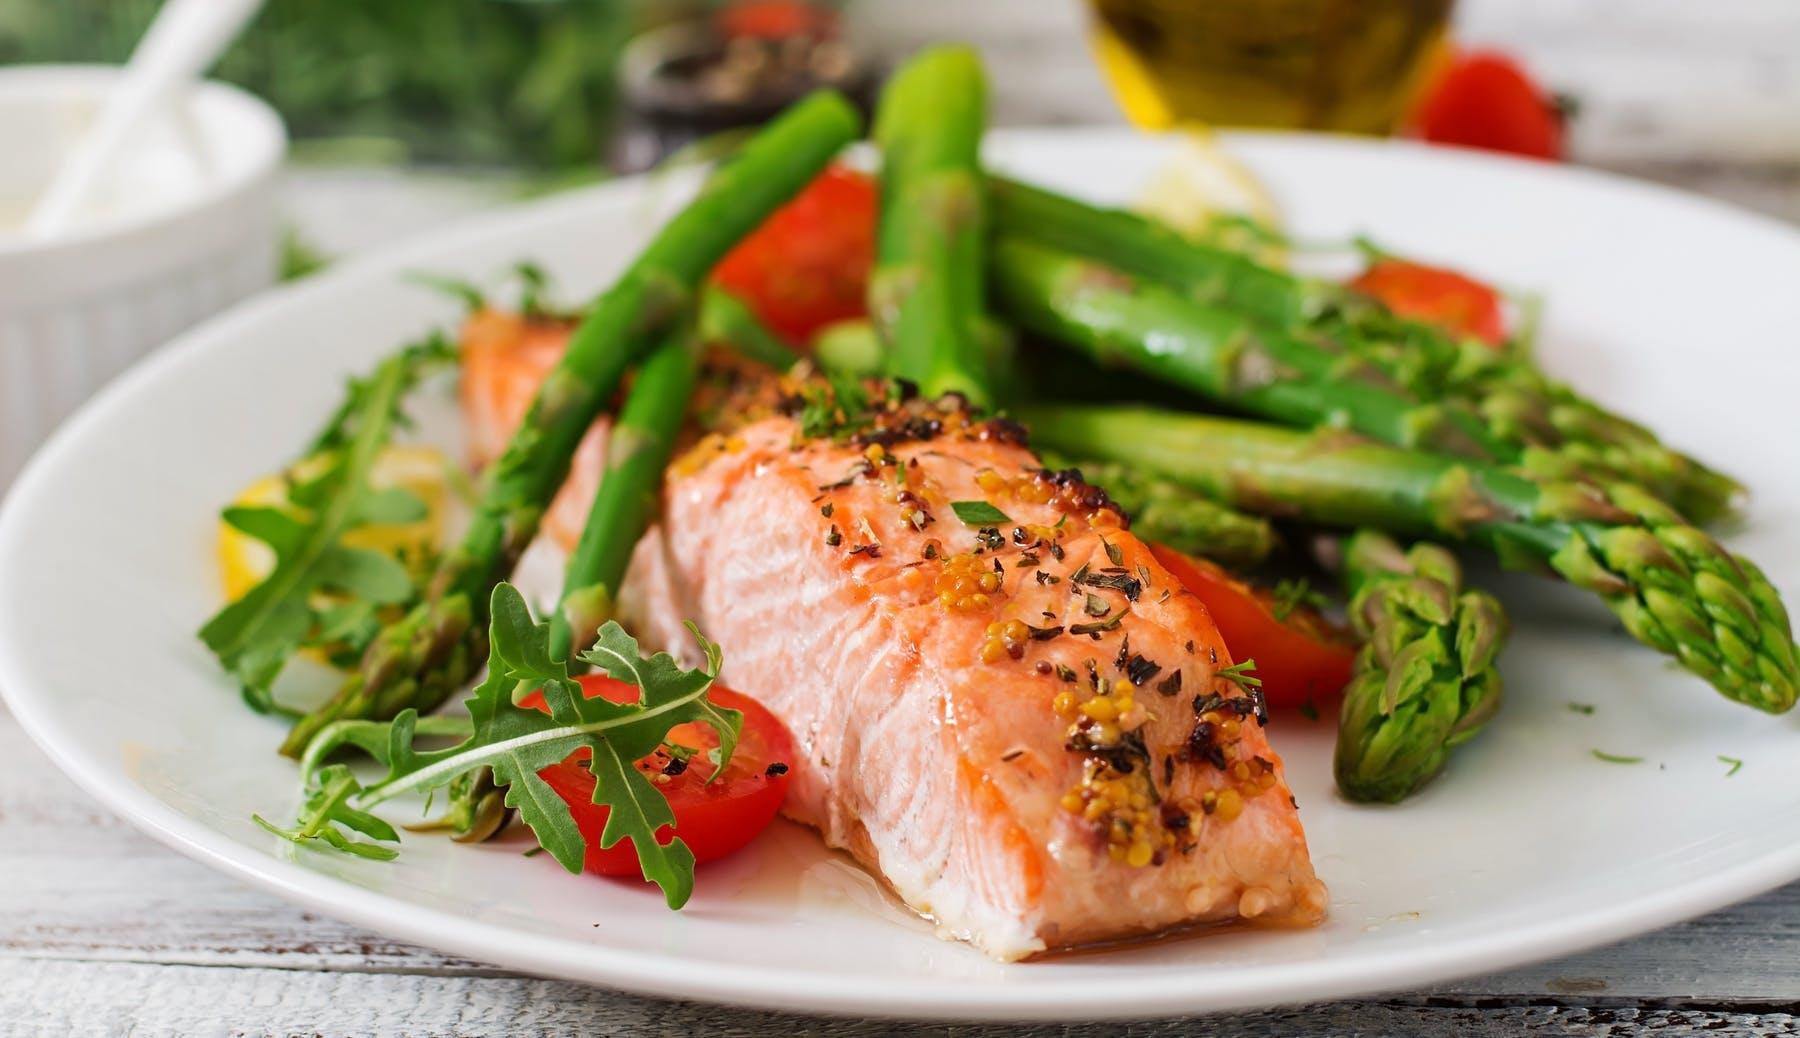 salmon with asparagus on a plate